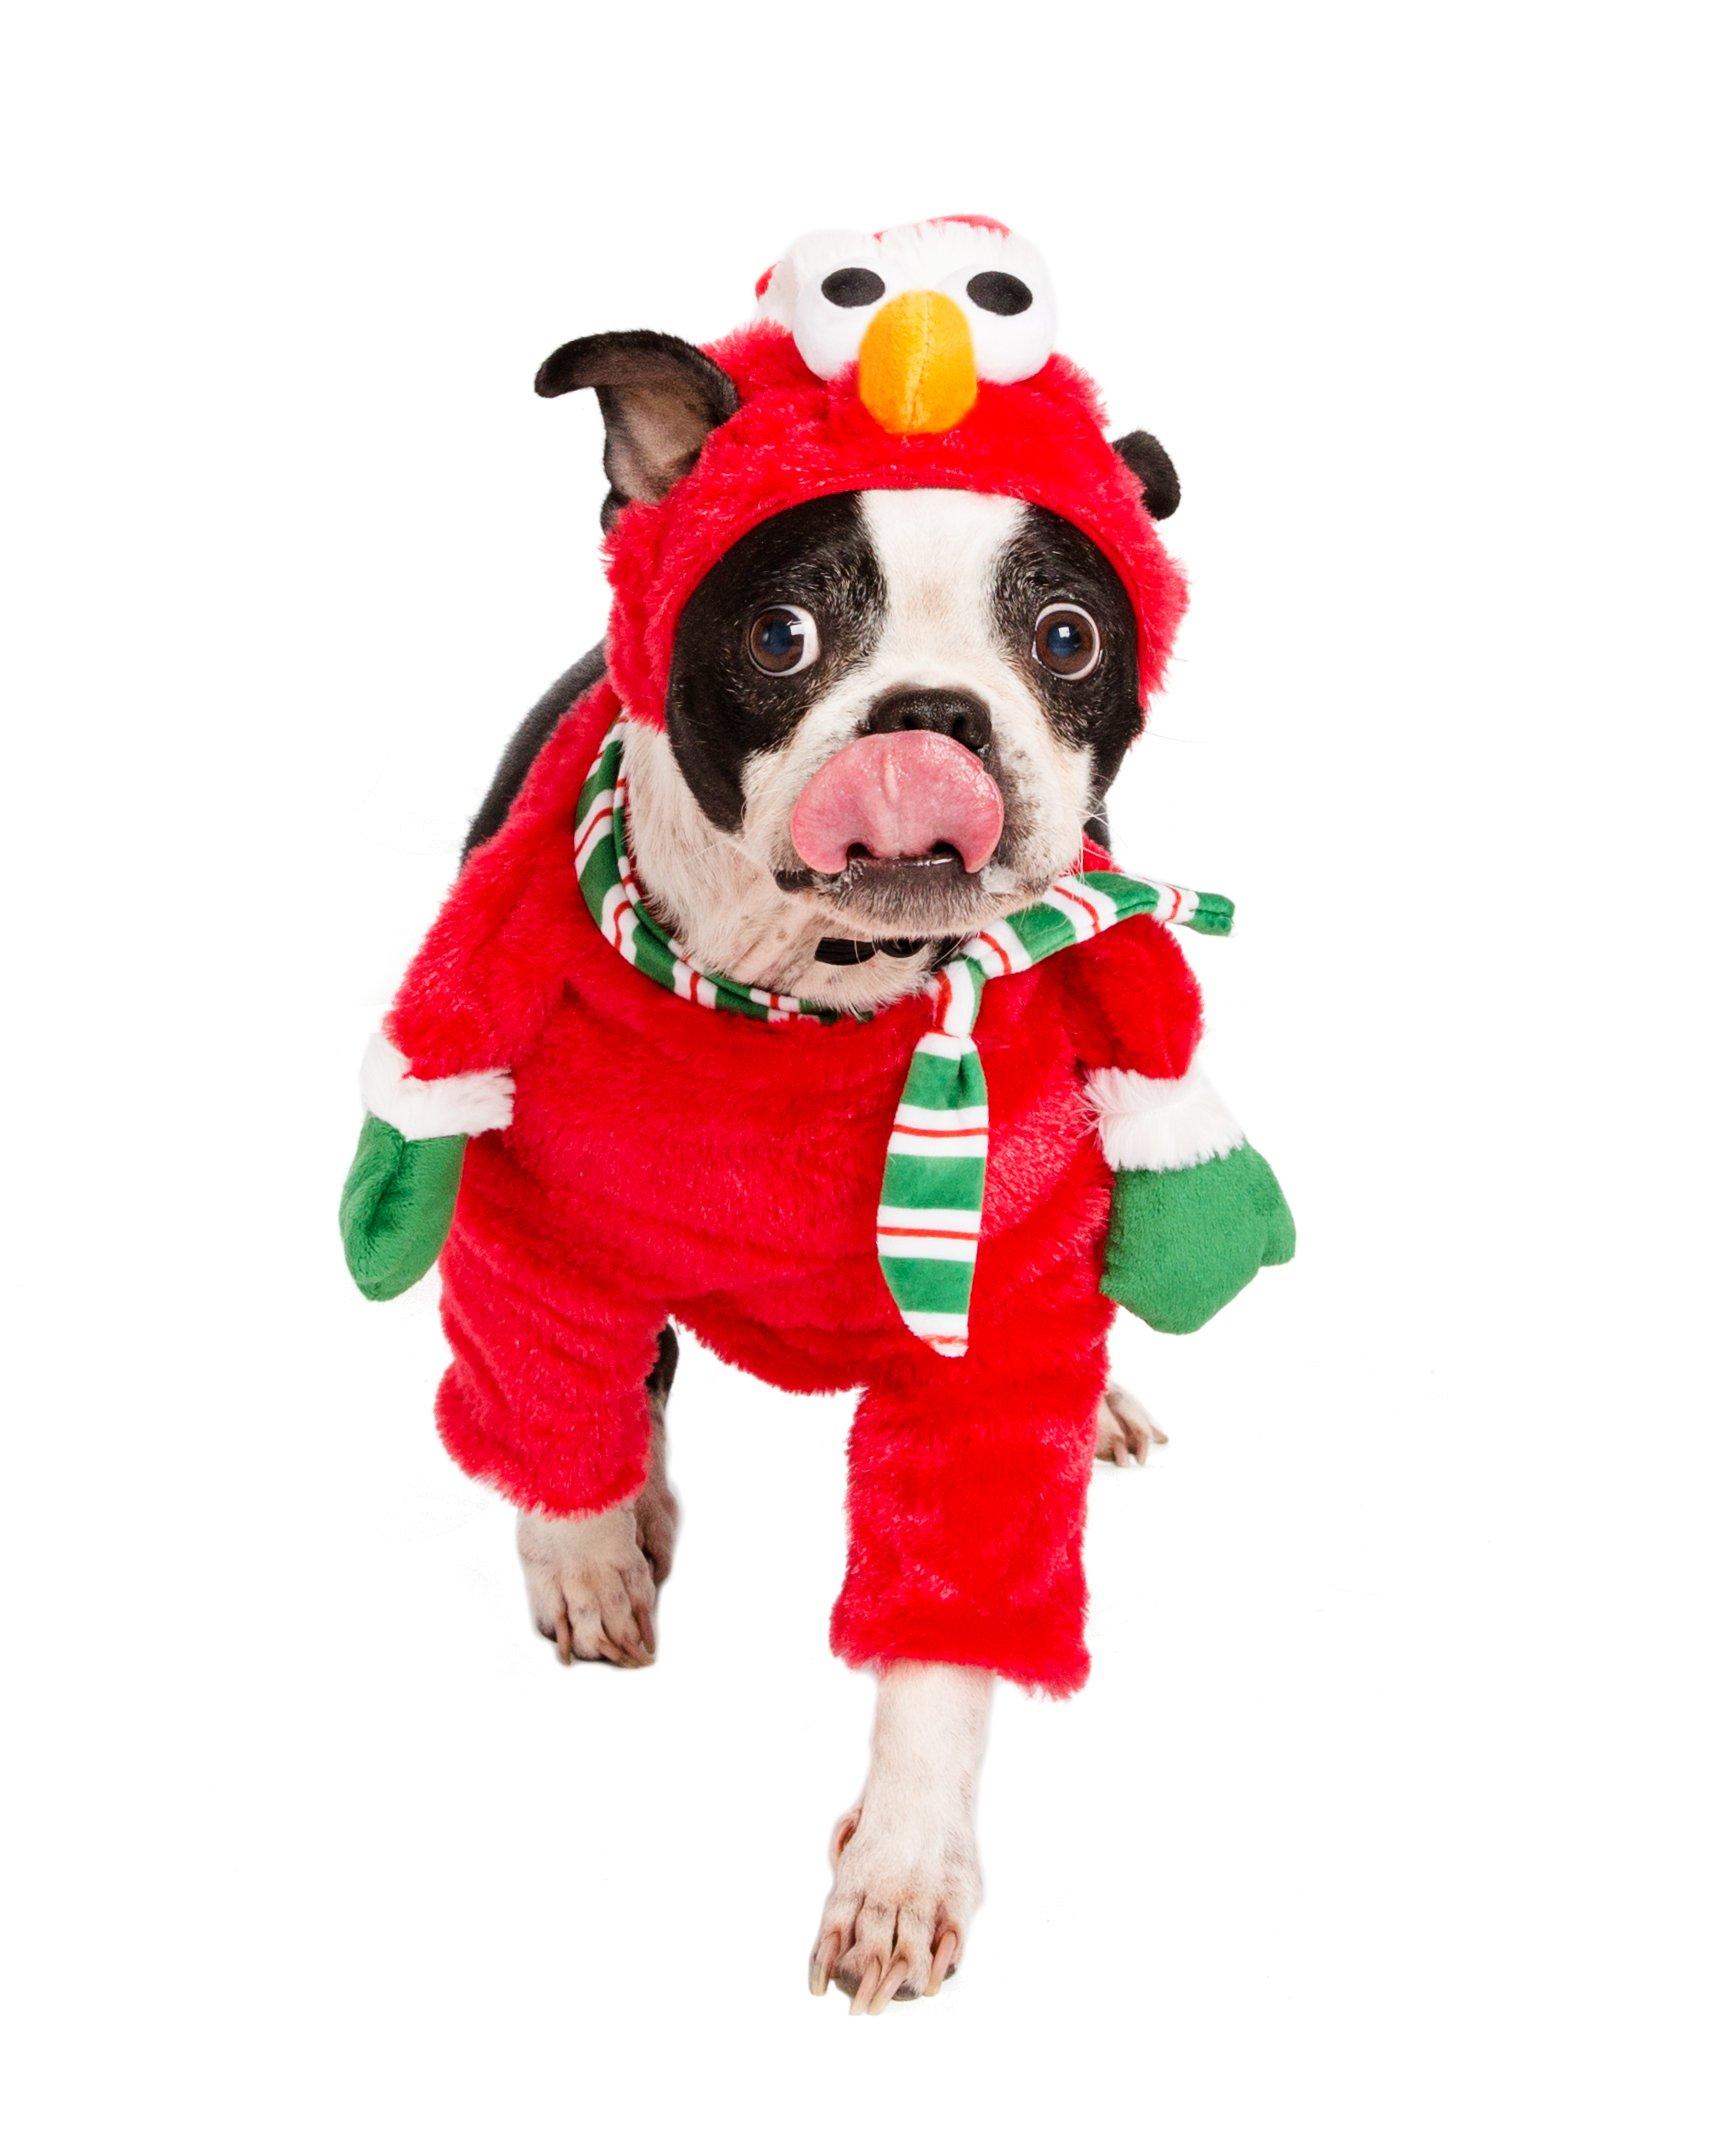 Christmas_Elmo_CUTOUT_1.jpg